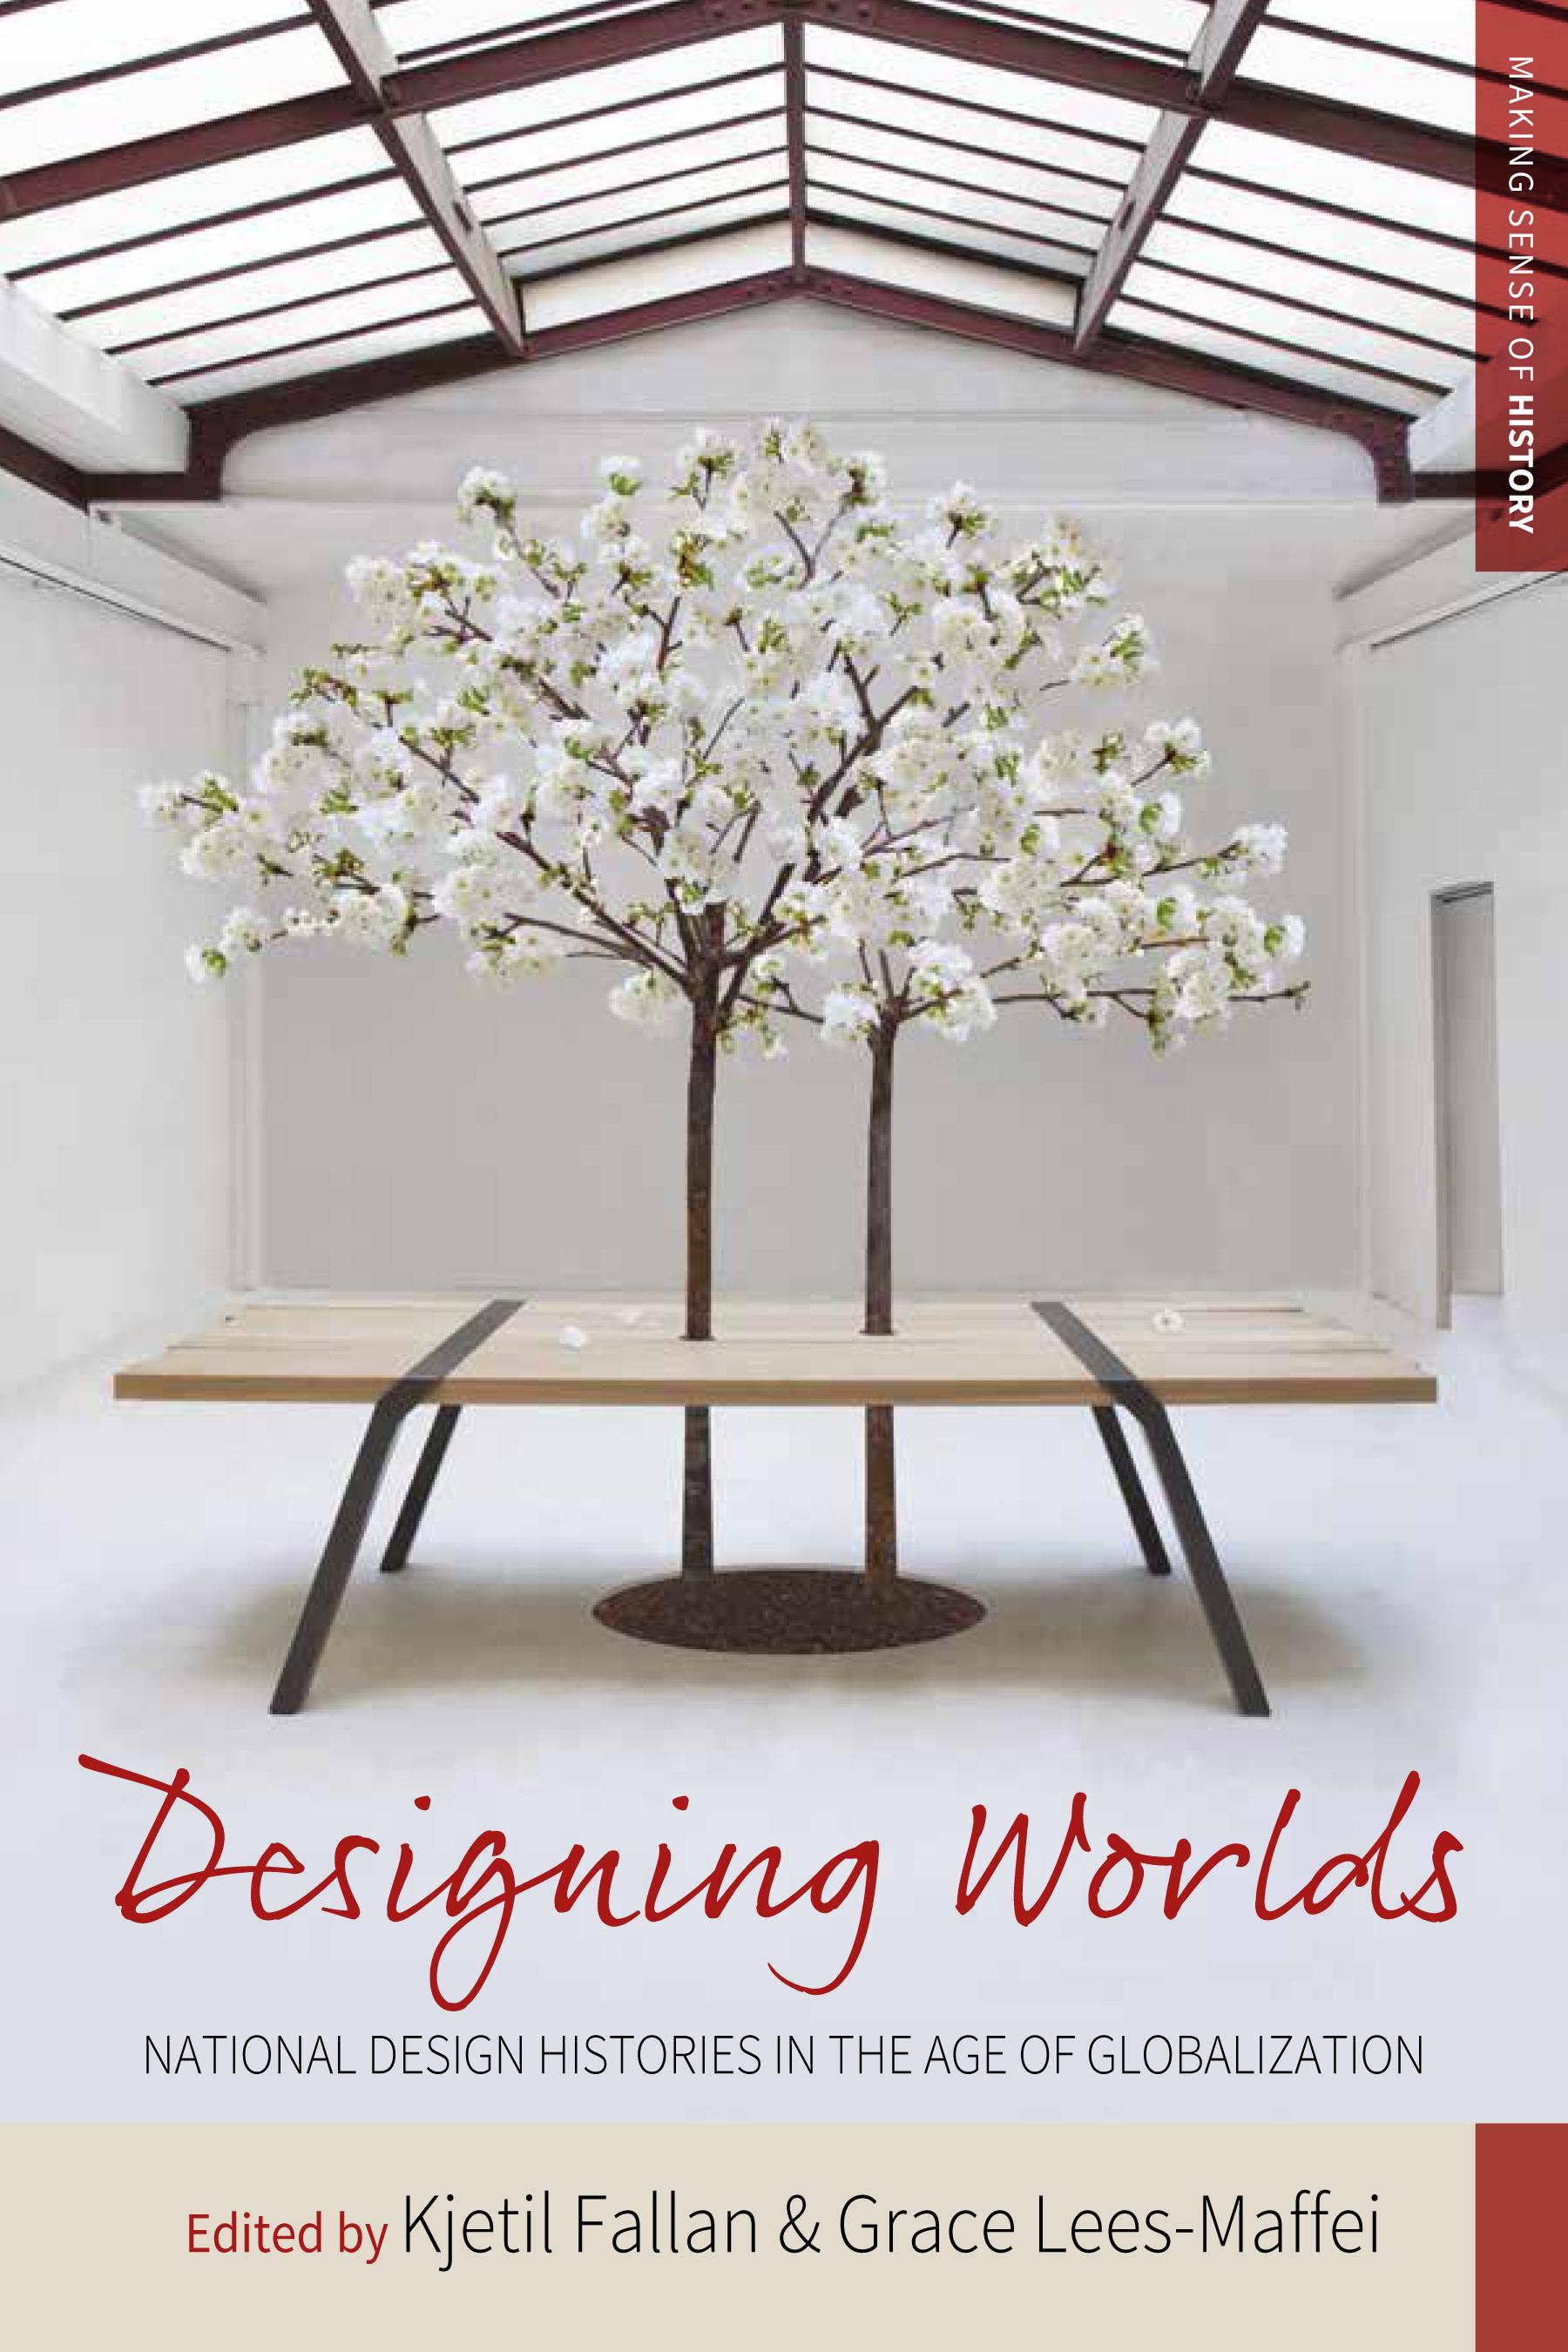 Designing Worlds - National Design Histories in an Age of Globalization. Edited by Kjetil Fallan and Grace Lees-Maffei. New York: Berghahn Books, 2016.